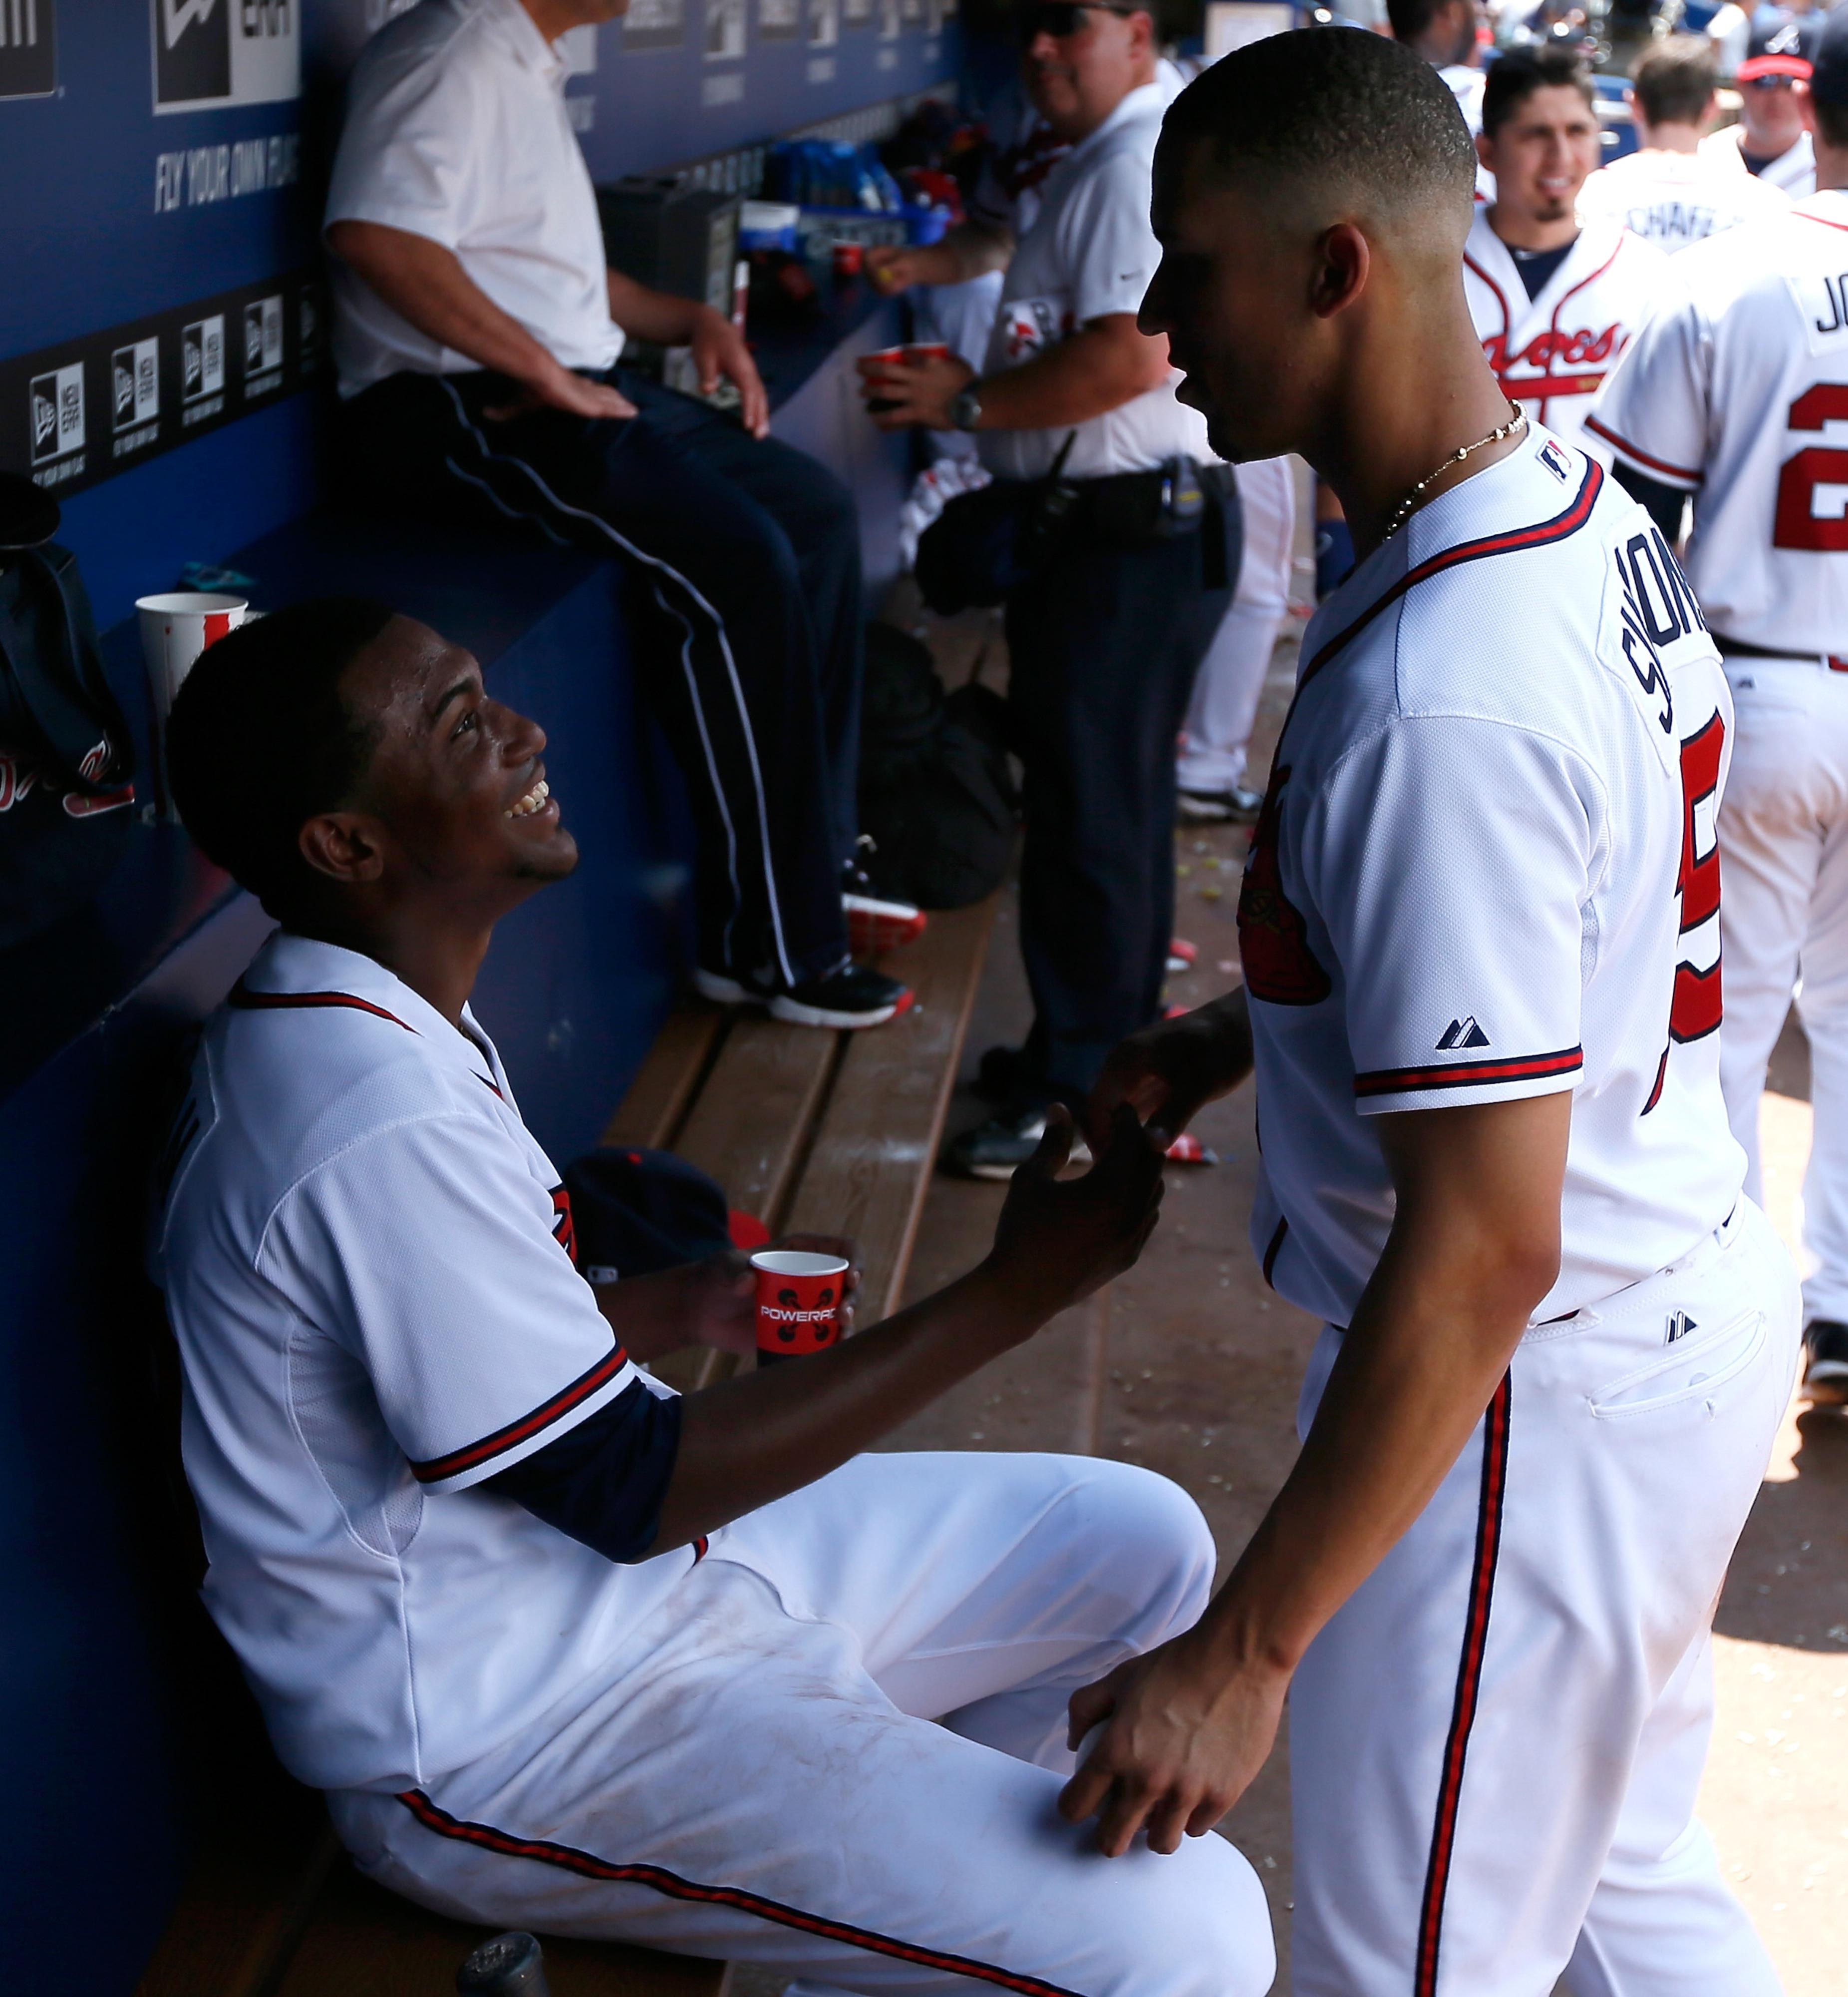 Braves rumors: Atlanta could also extend Andrelton Simmons, Julio Teheran